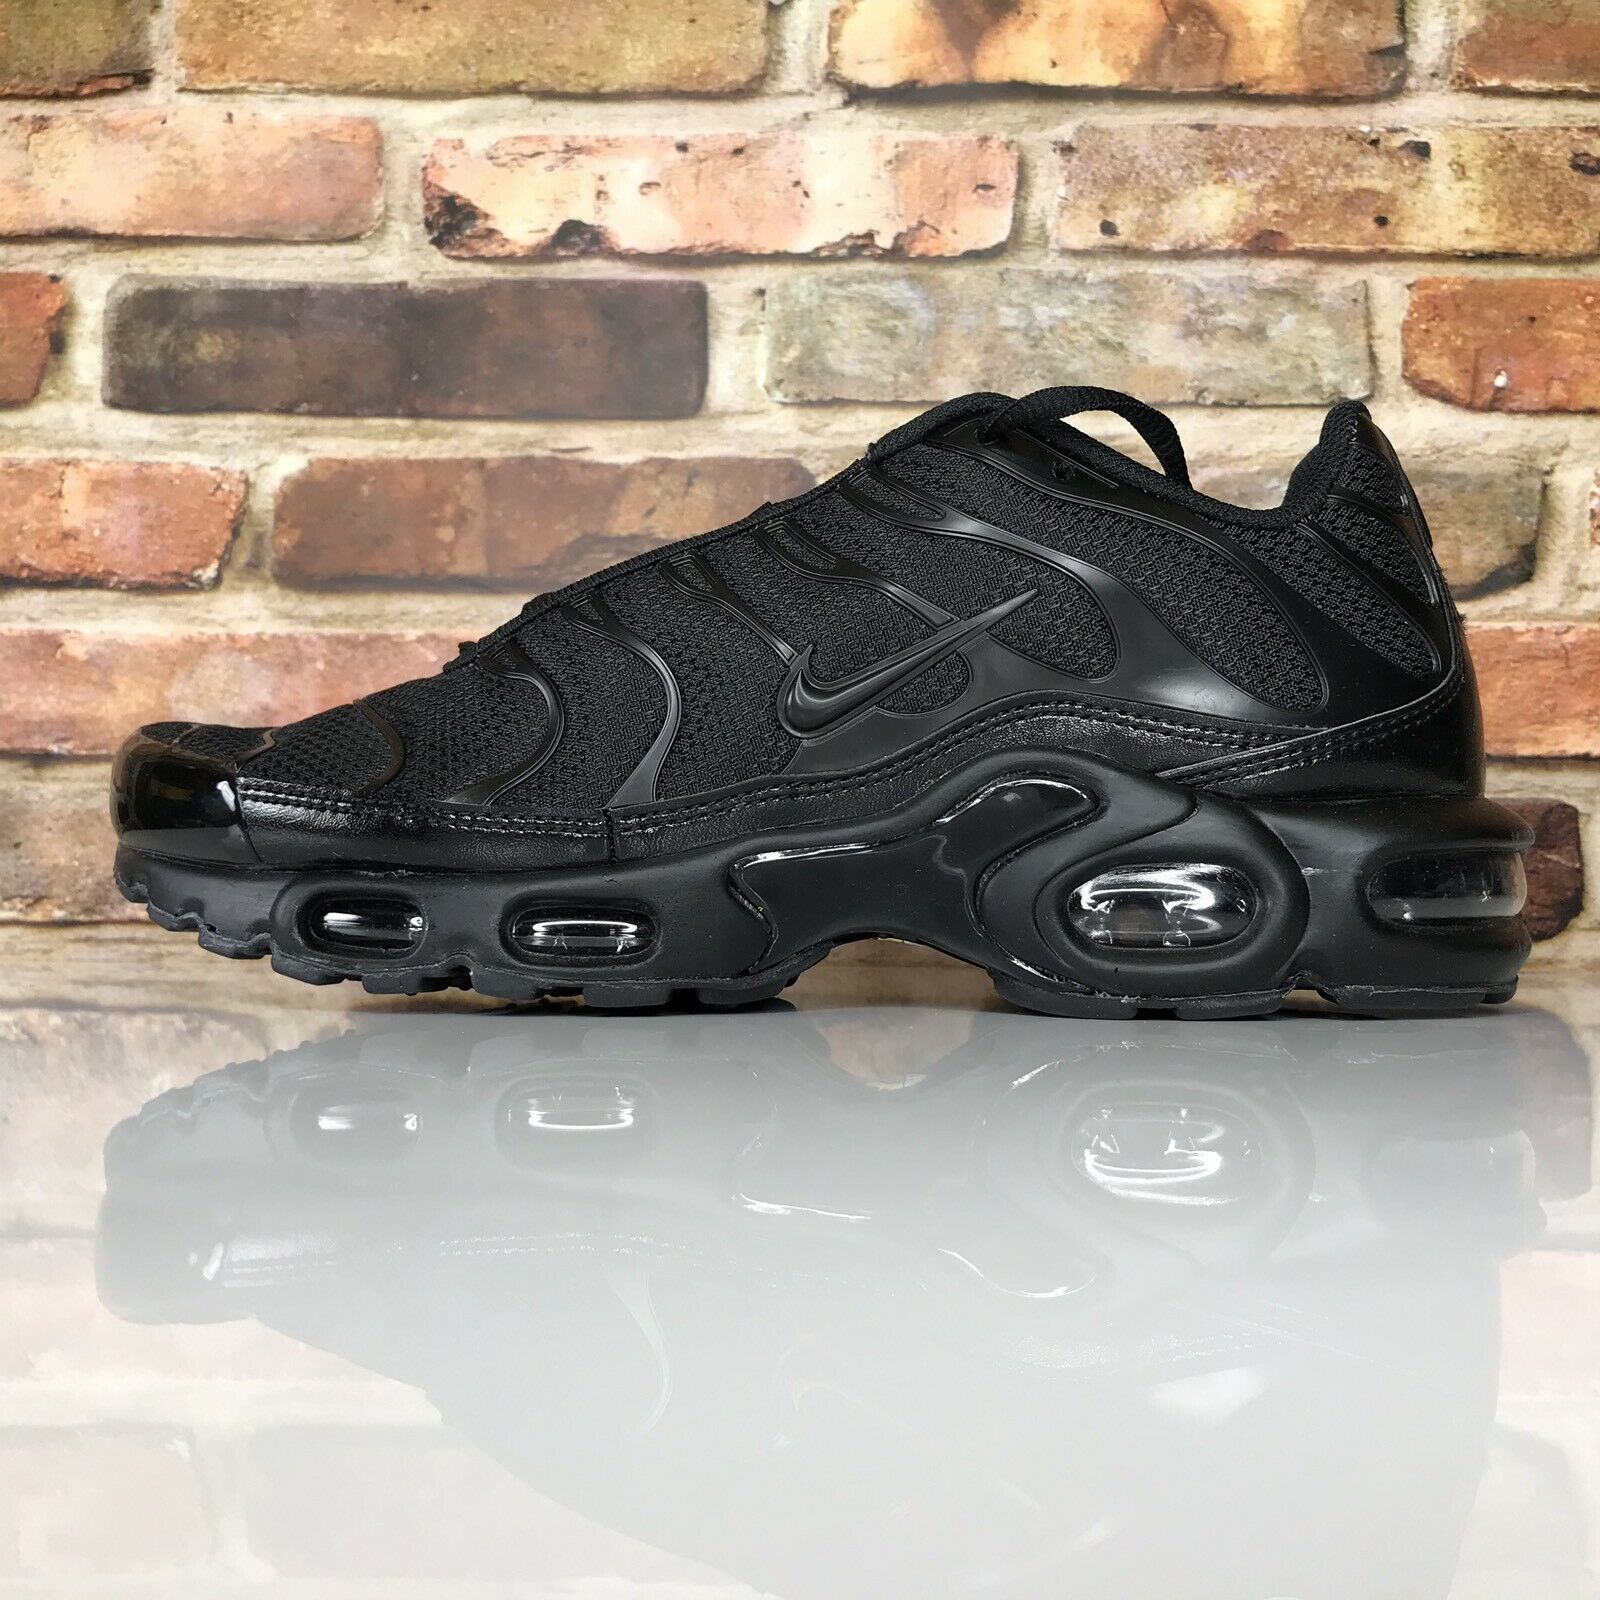 Nike Air Max Plus Mens Size 9 Triple Black 604133-050